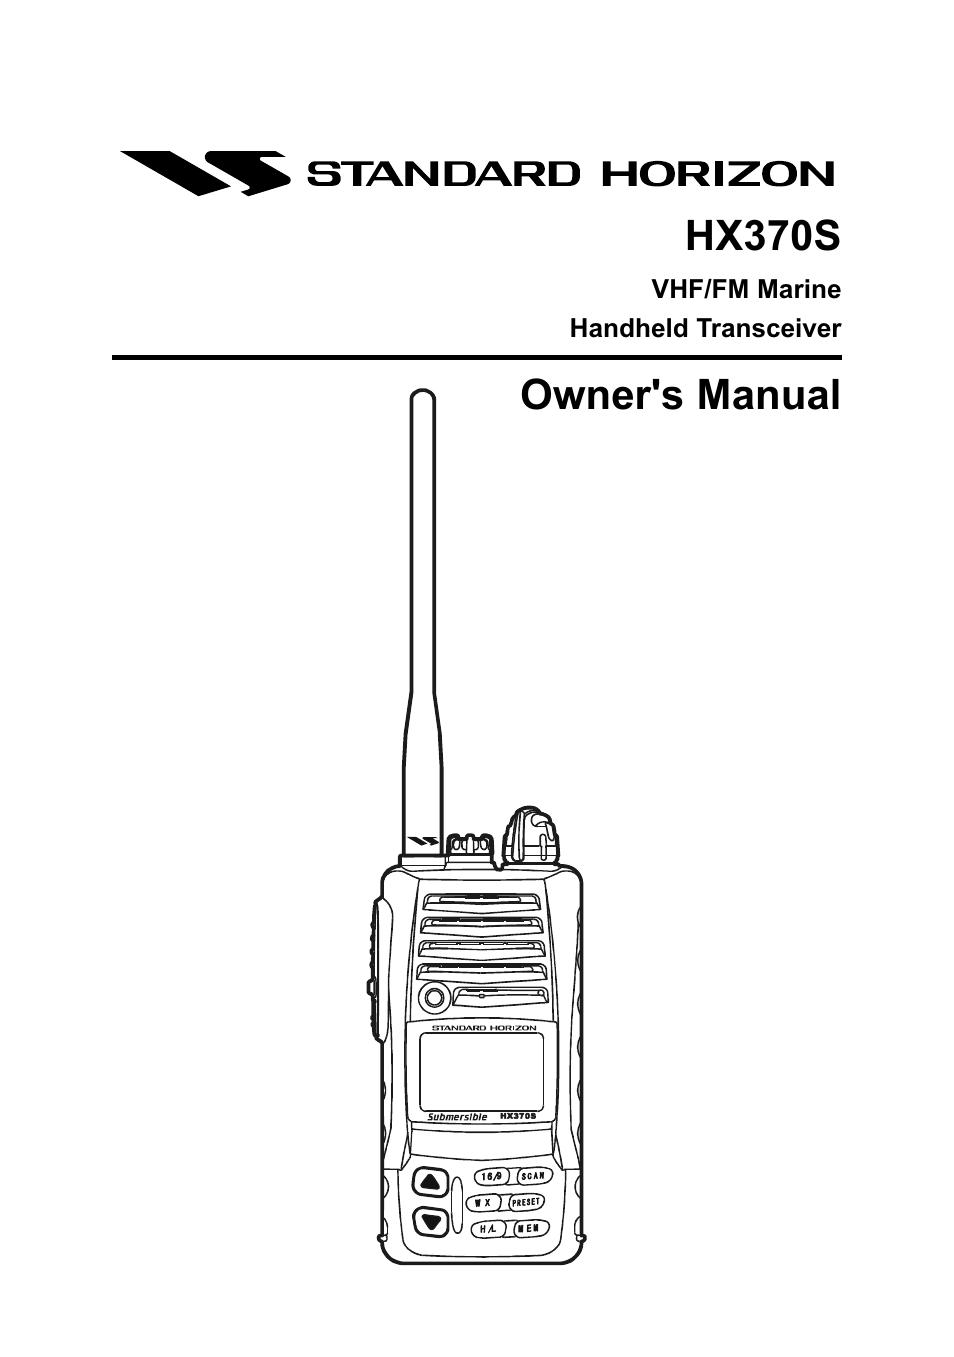 standard horizon hx370s user manual 48 pages rh manualsdir com Standard Horizon Submersible HX370S standard horizon hx370s service manual